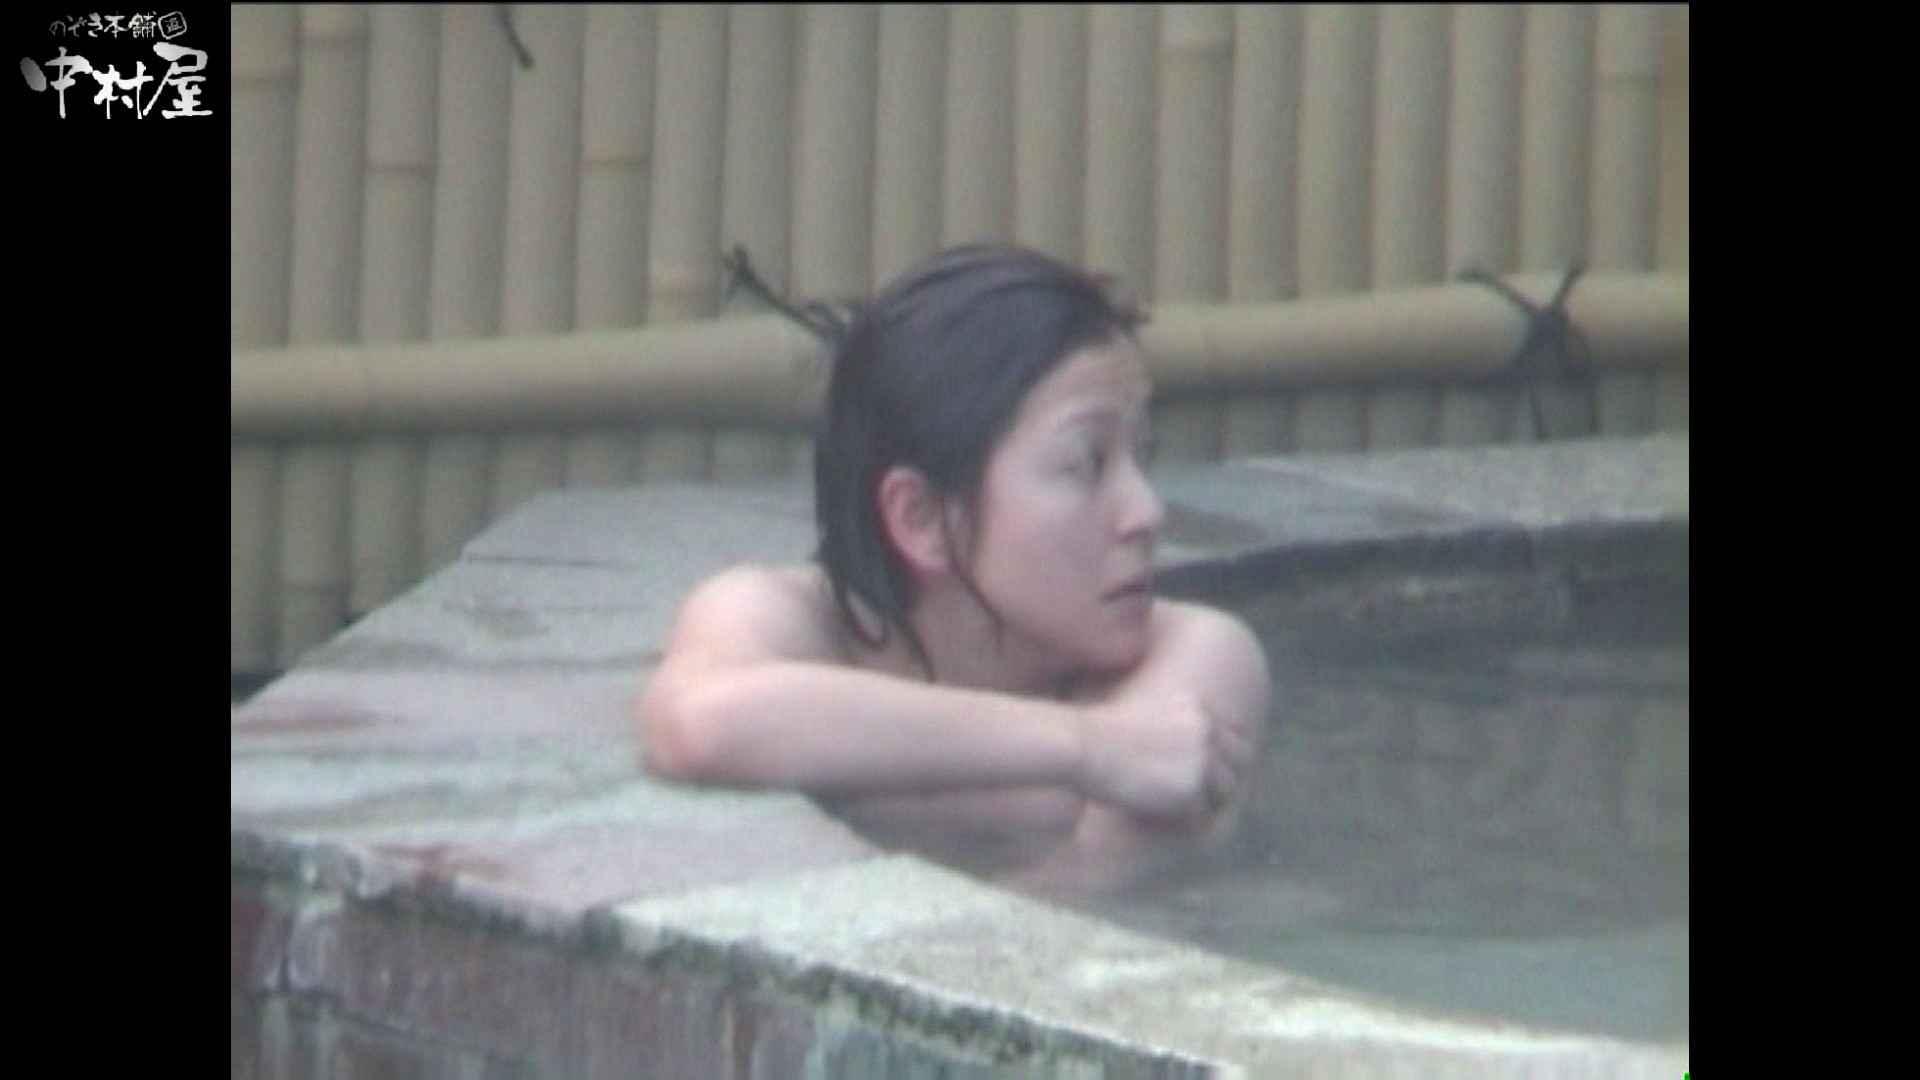 Aquaな露天風呂Vol.986 盗撮  94連発 20